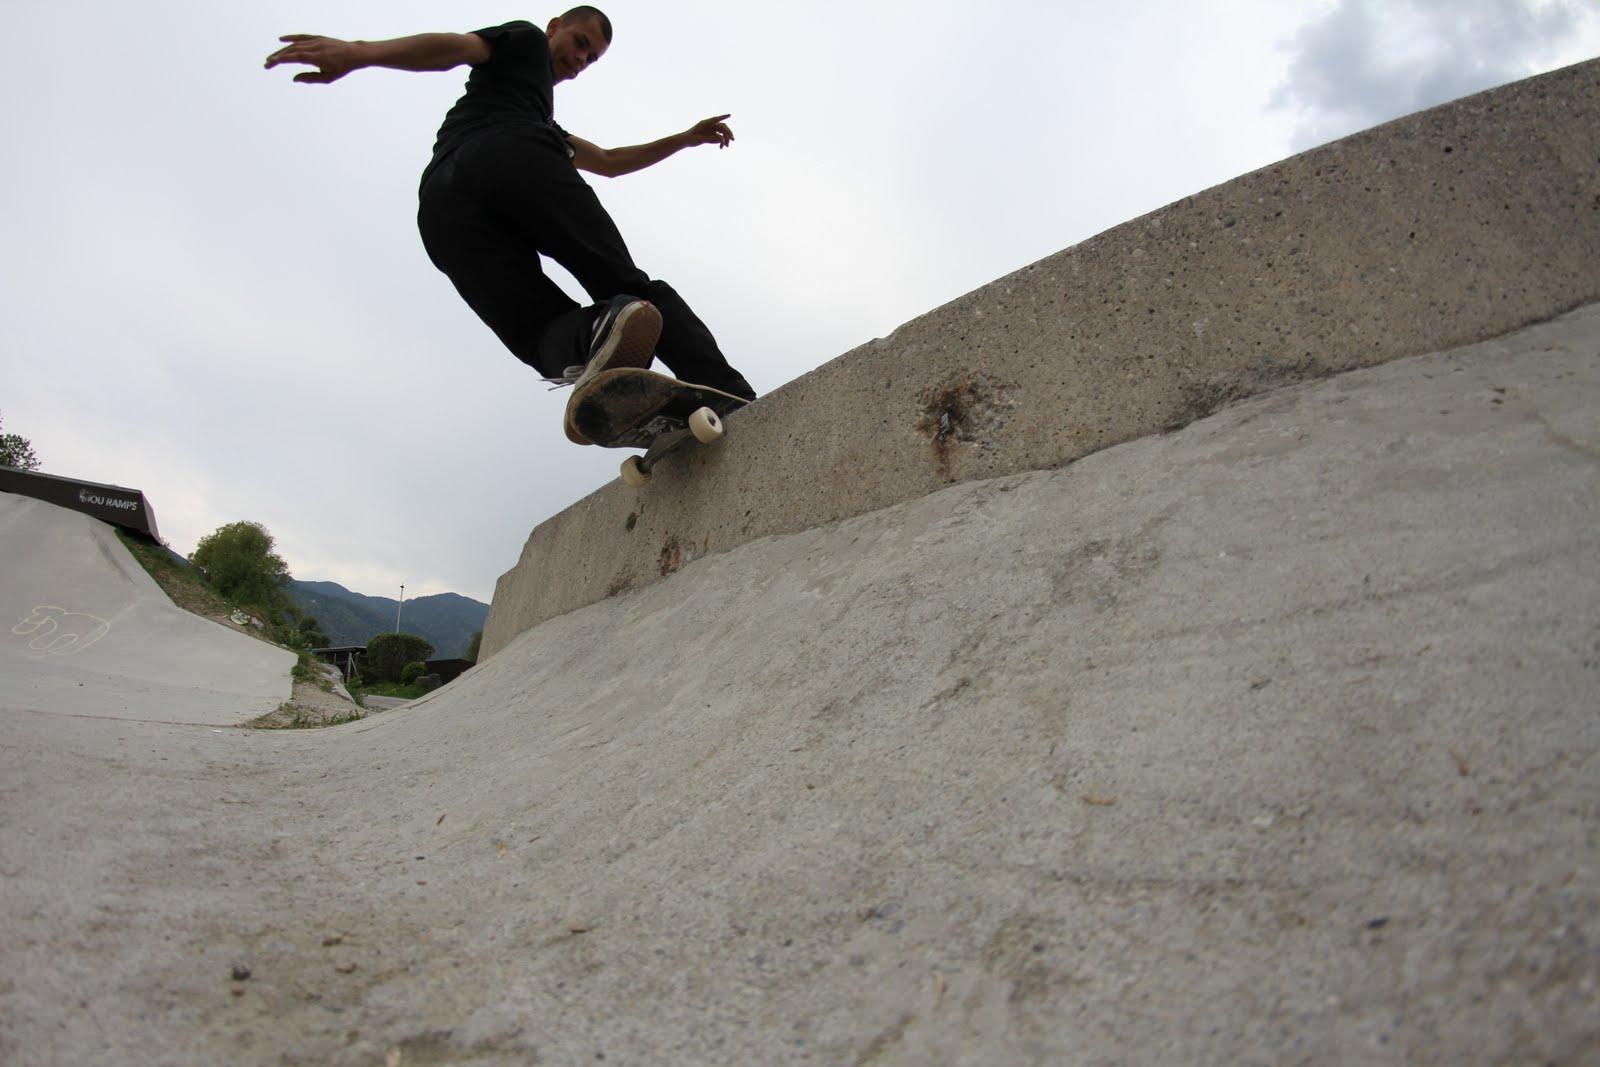 Roll On Pool Plaster Diy Sider Crete Inc: Crete-slave: Oktober 2011